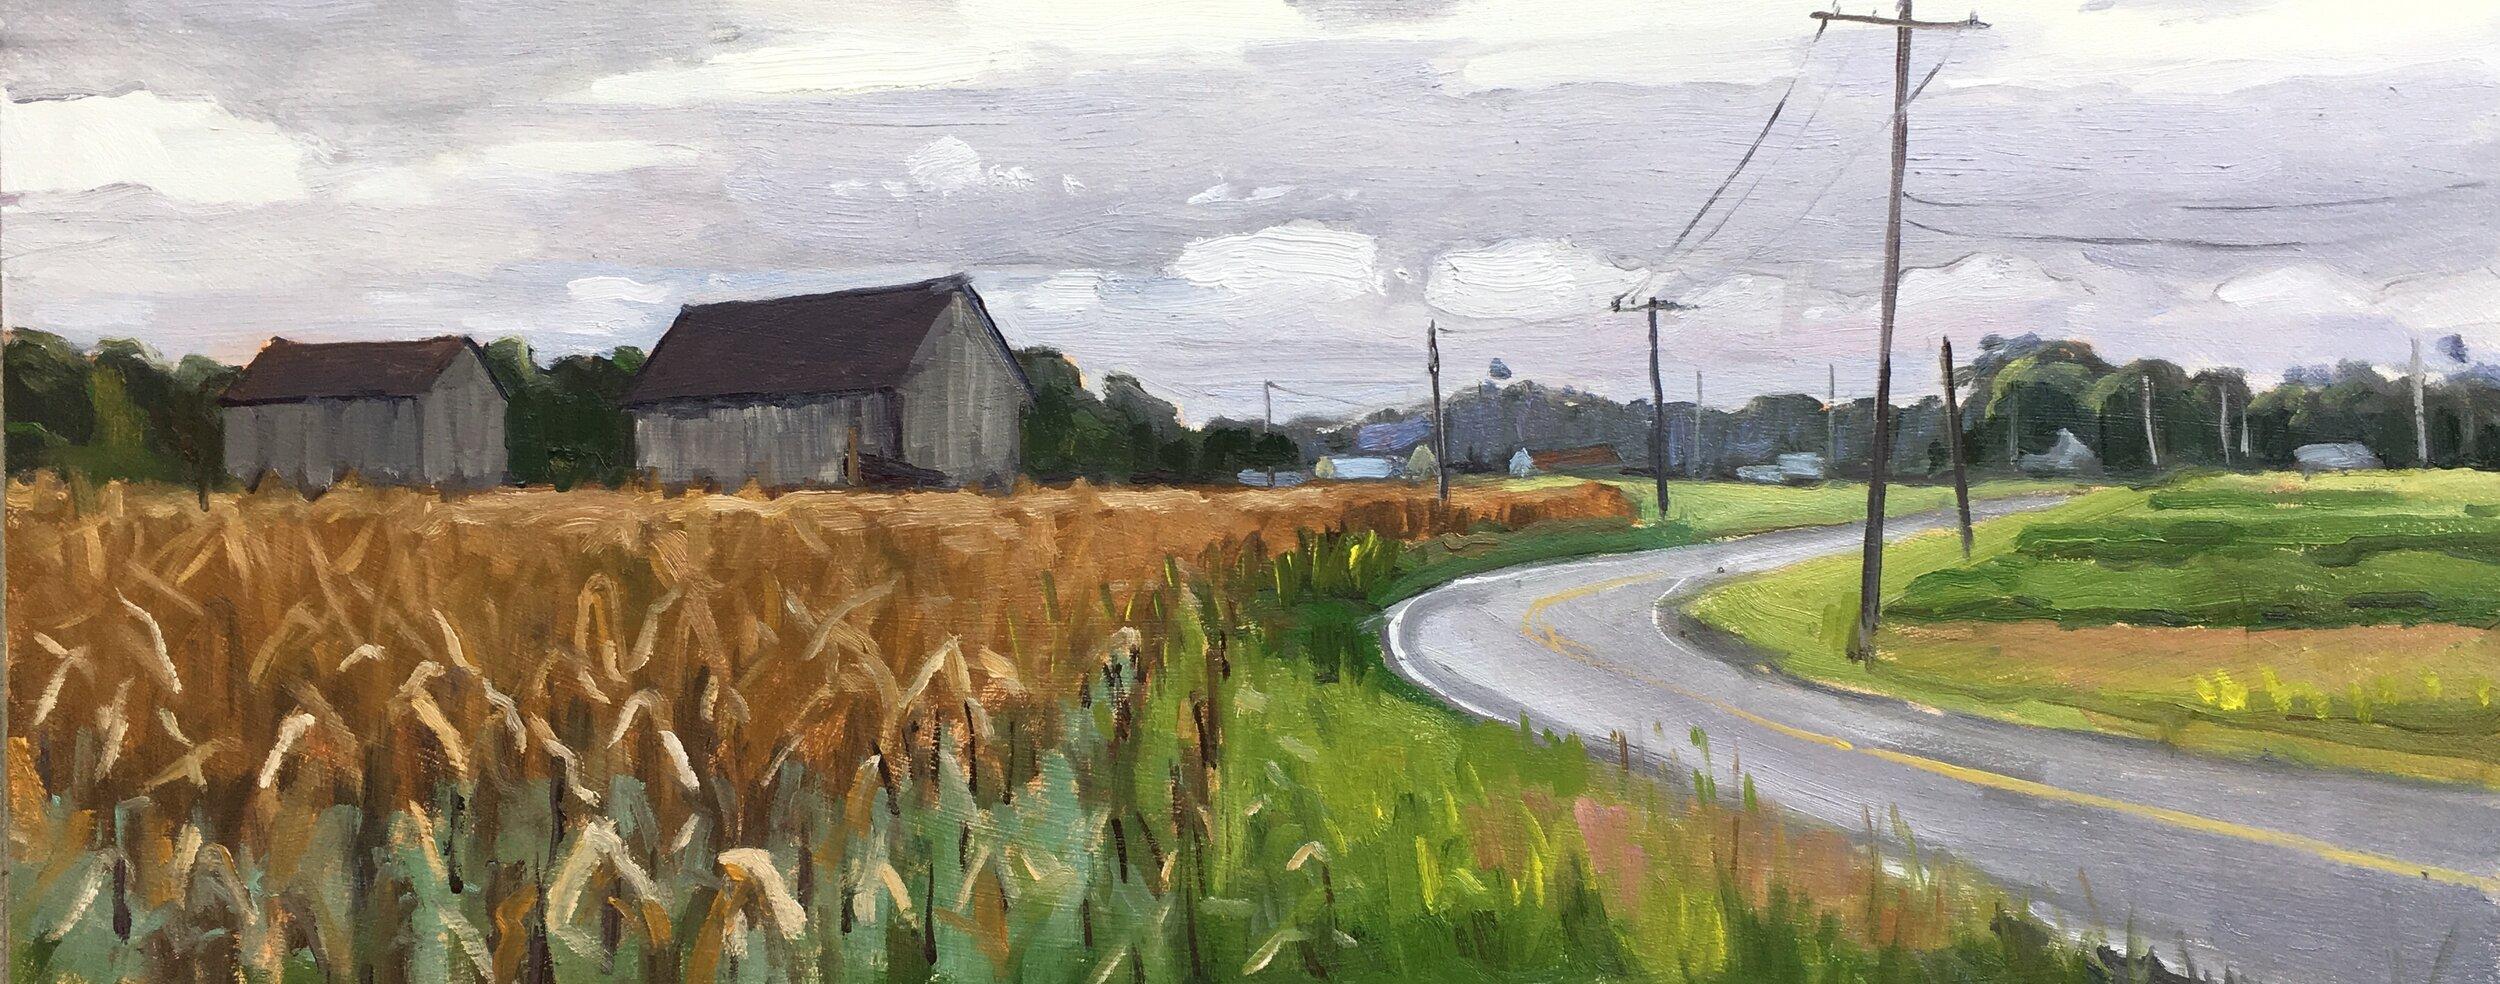 Parran Road - Late Summer